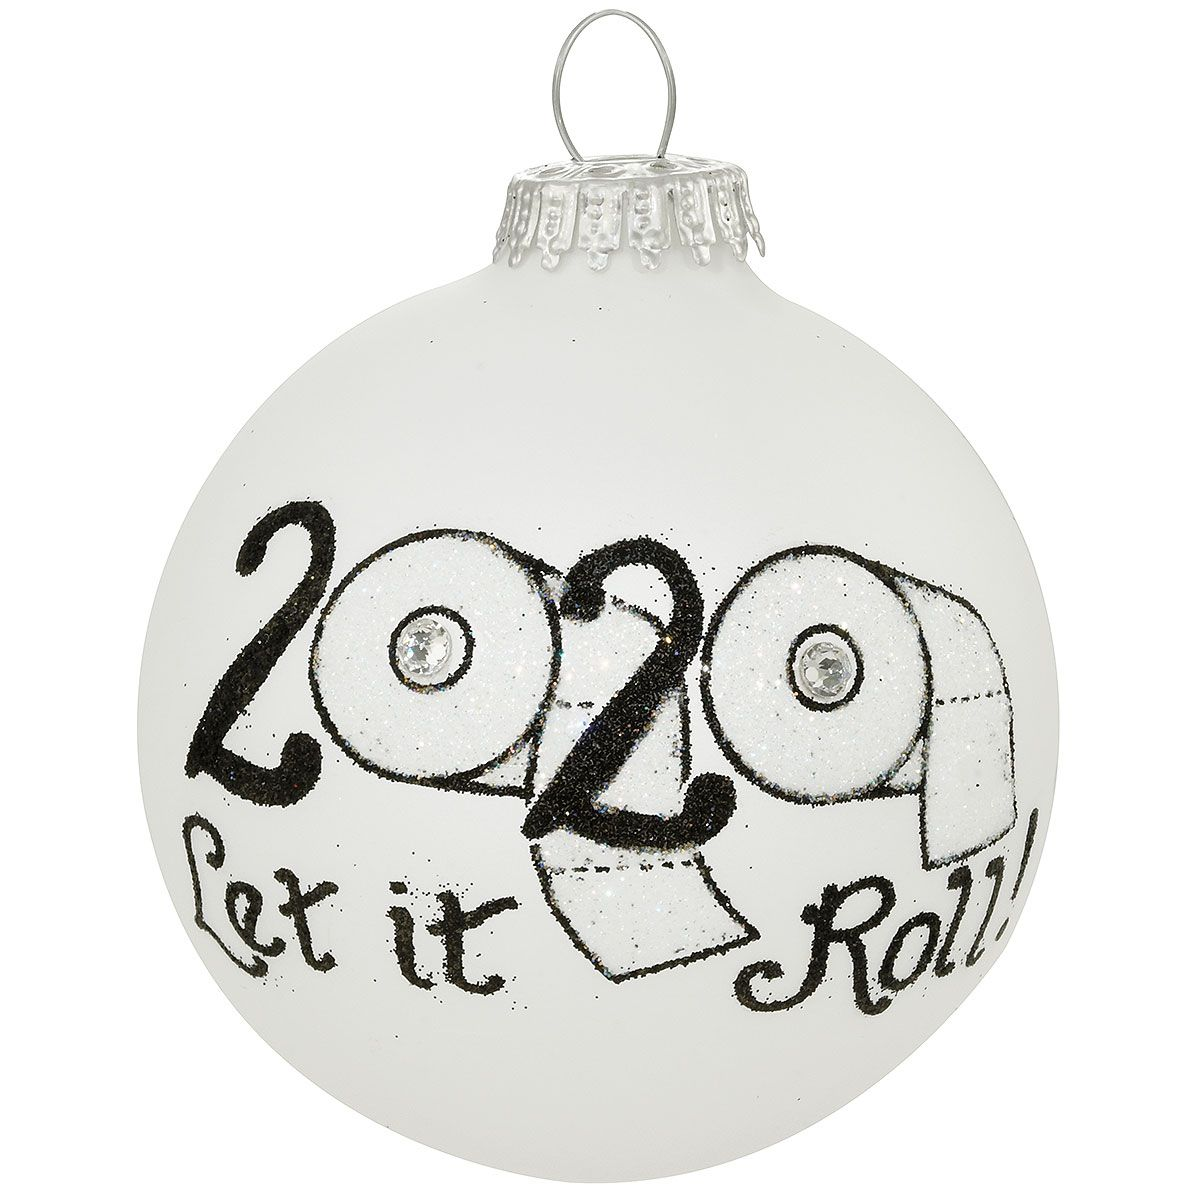 2020 Let It Roll Teresa Thibault Glass Ornament Glass Ornaments How To Make Ornaments Shiny Ornament